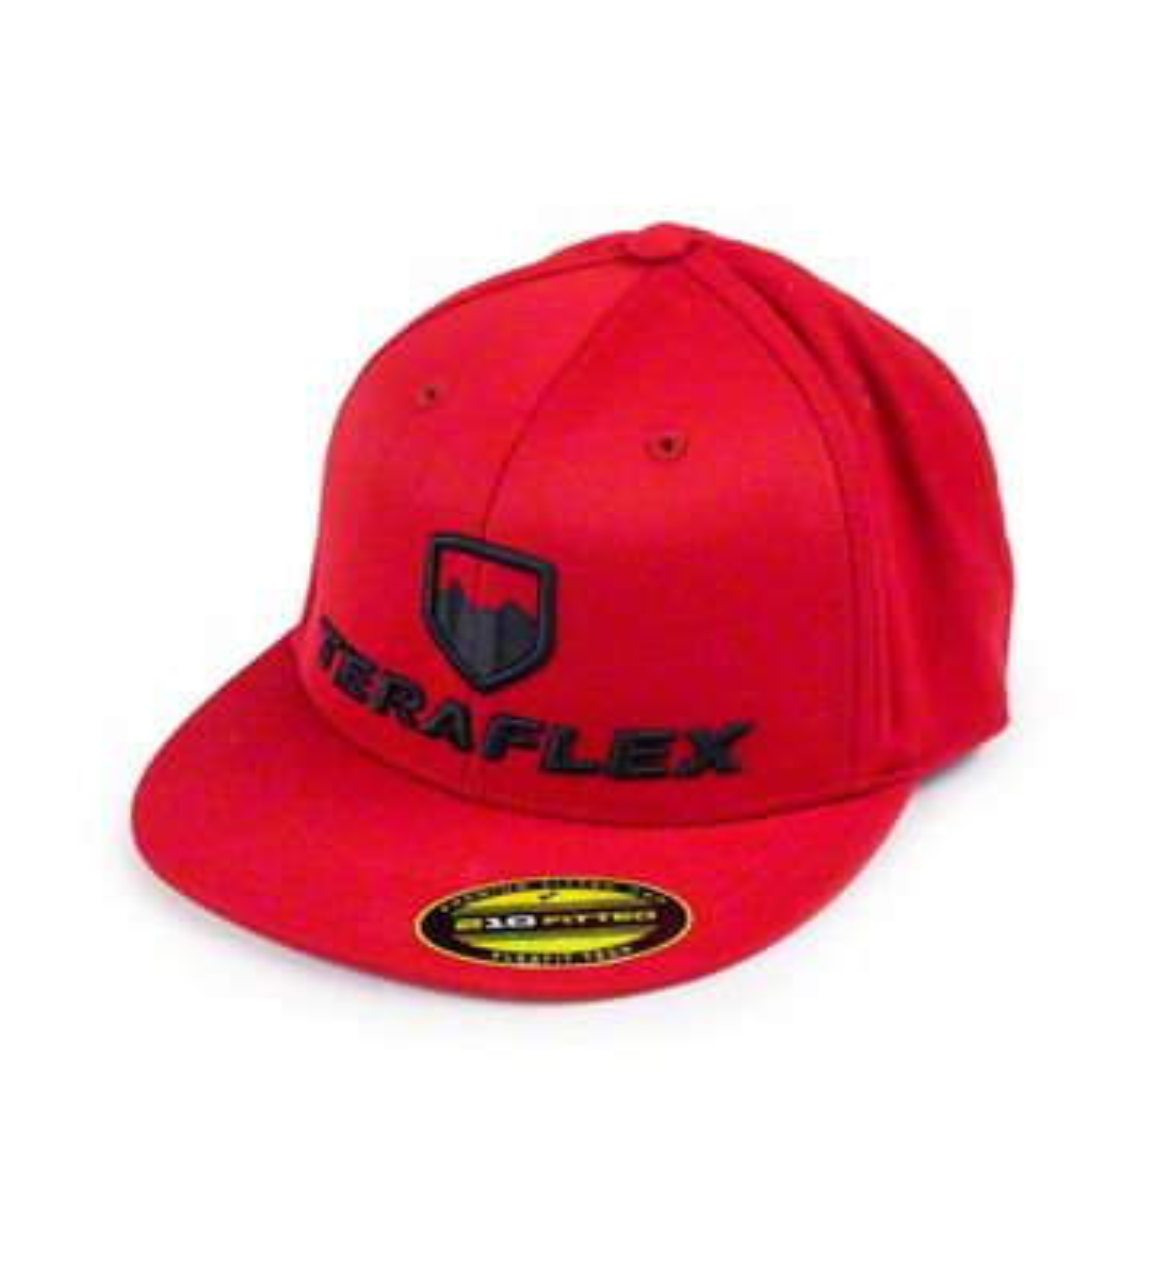 Teraflex Premium FlexFit Flat Visor Hat - Red